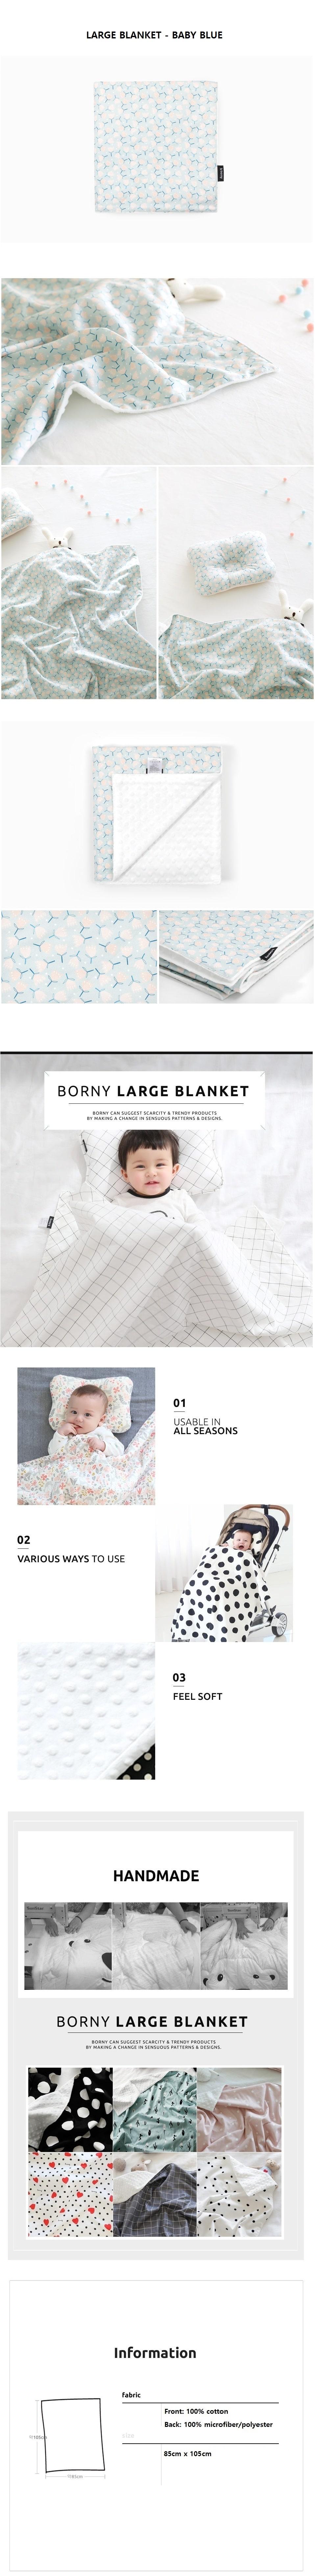 Large Blanket - Baby Blue